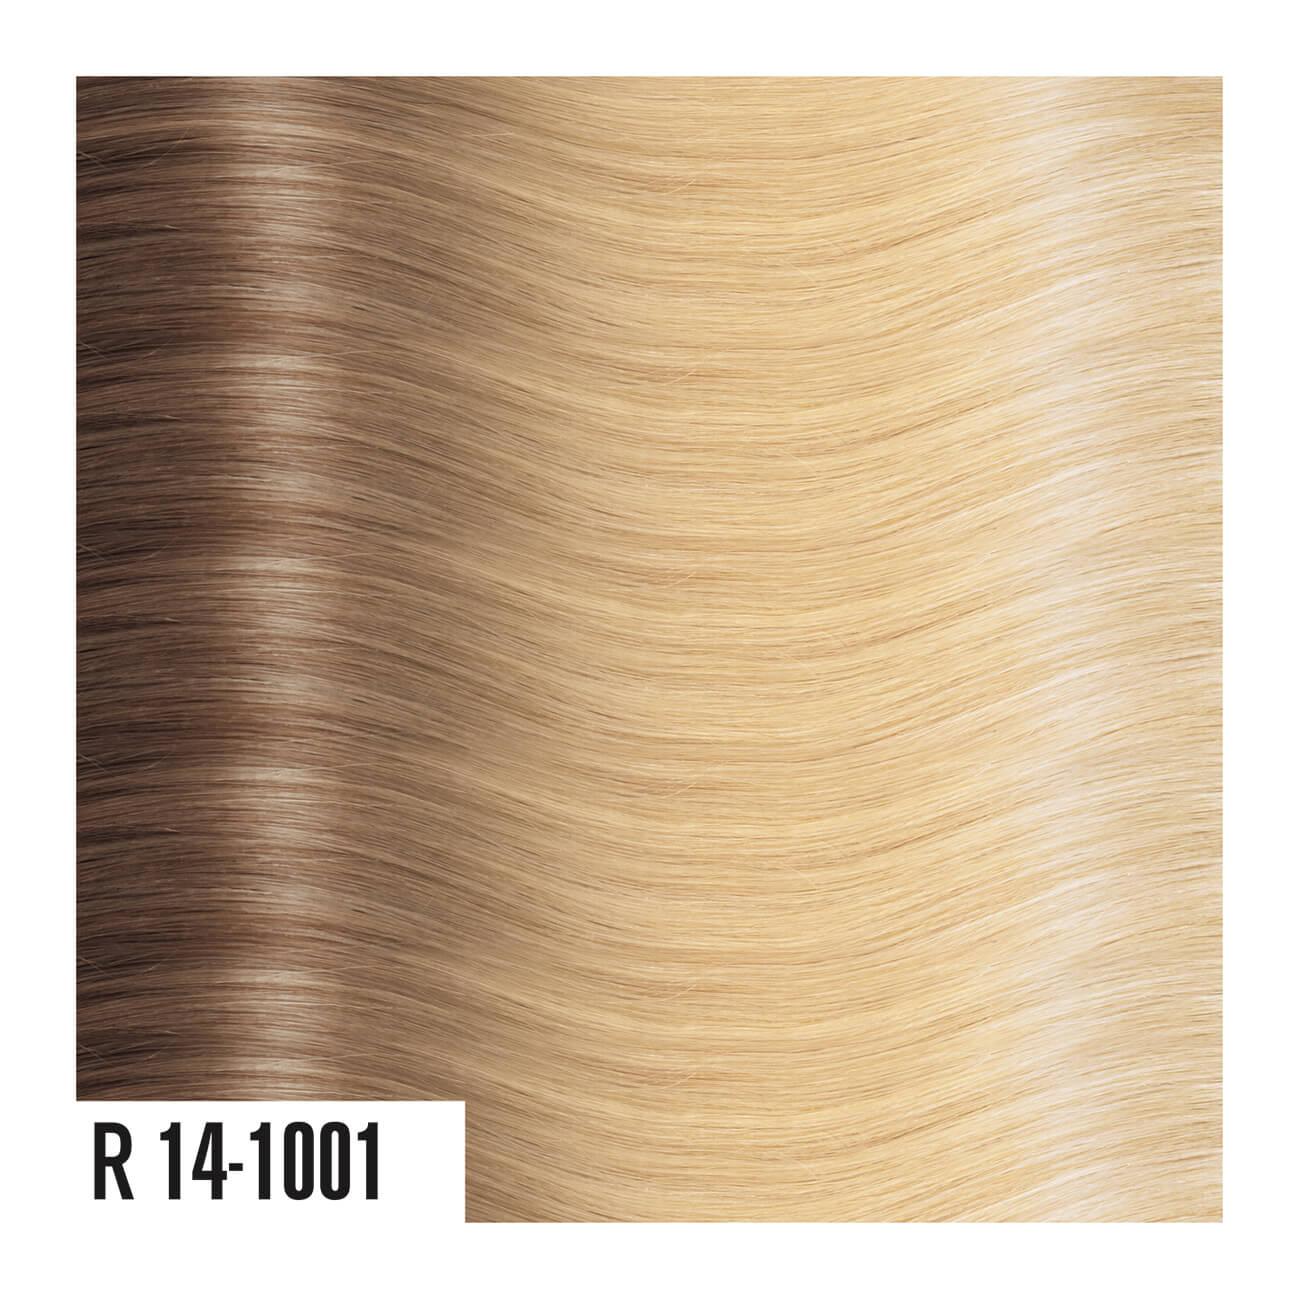 R14-1001